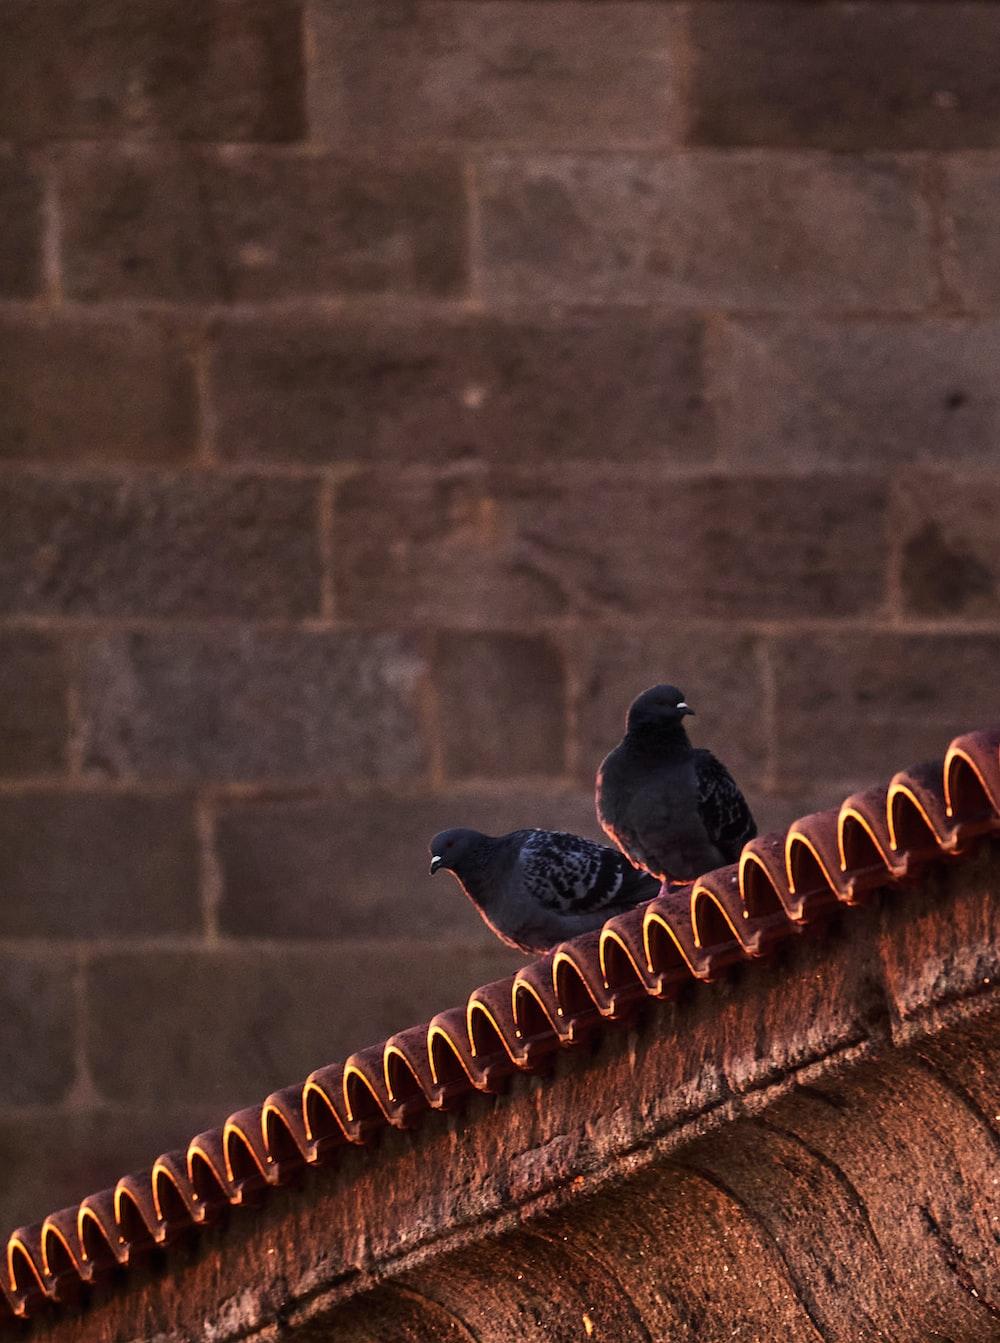 black bird on brown concrete wall during daytime